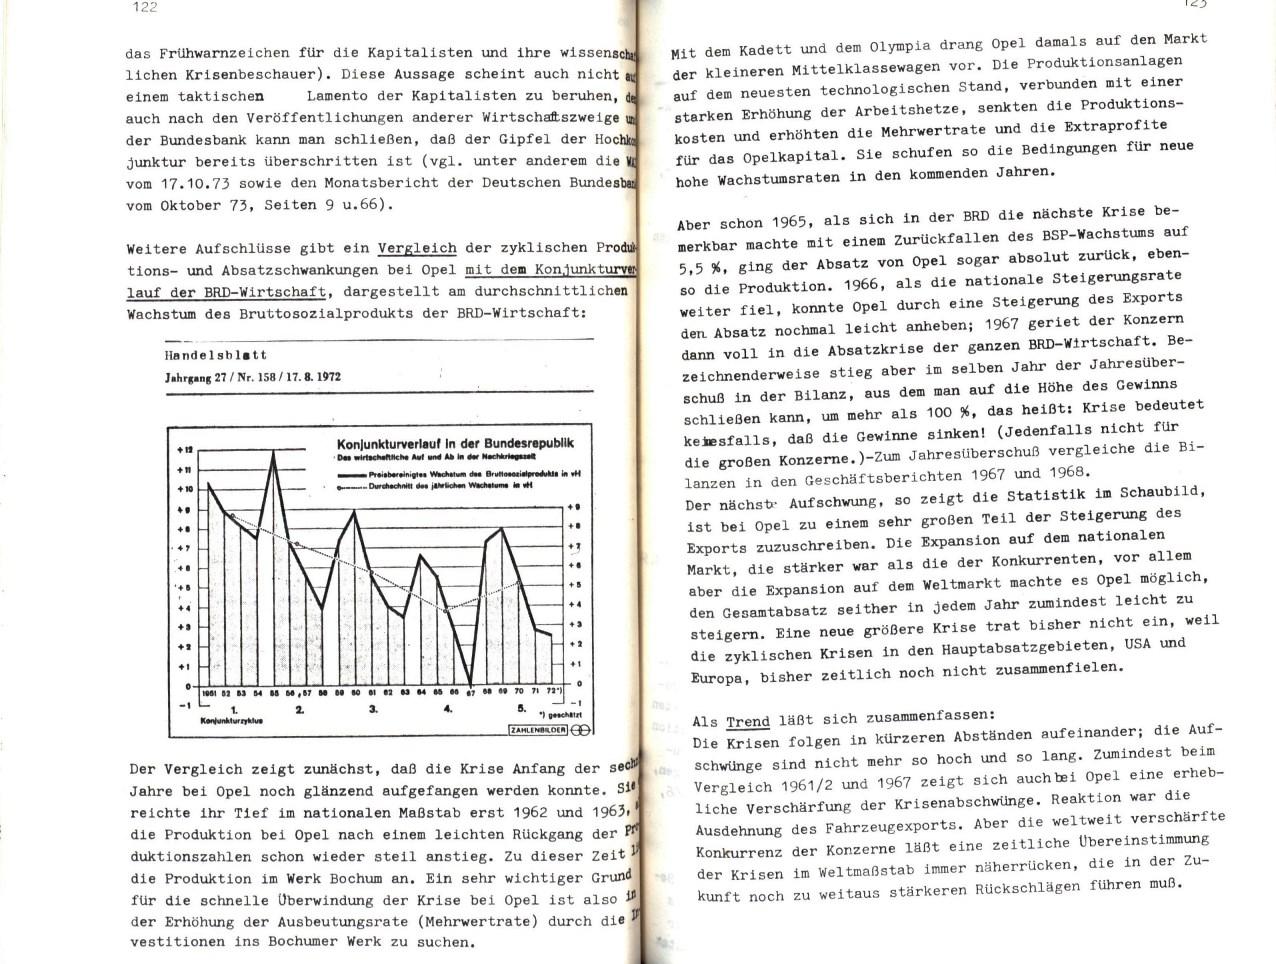 Bochum_IGM_Opel_PG_Opel_streikt_1973_063